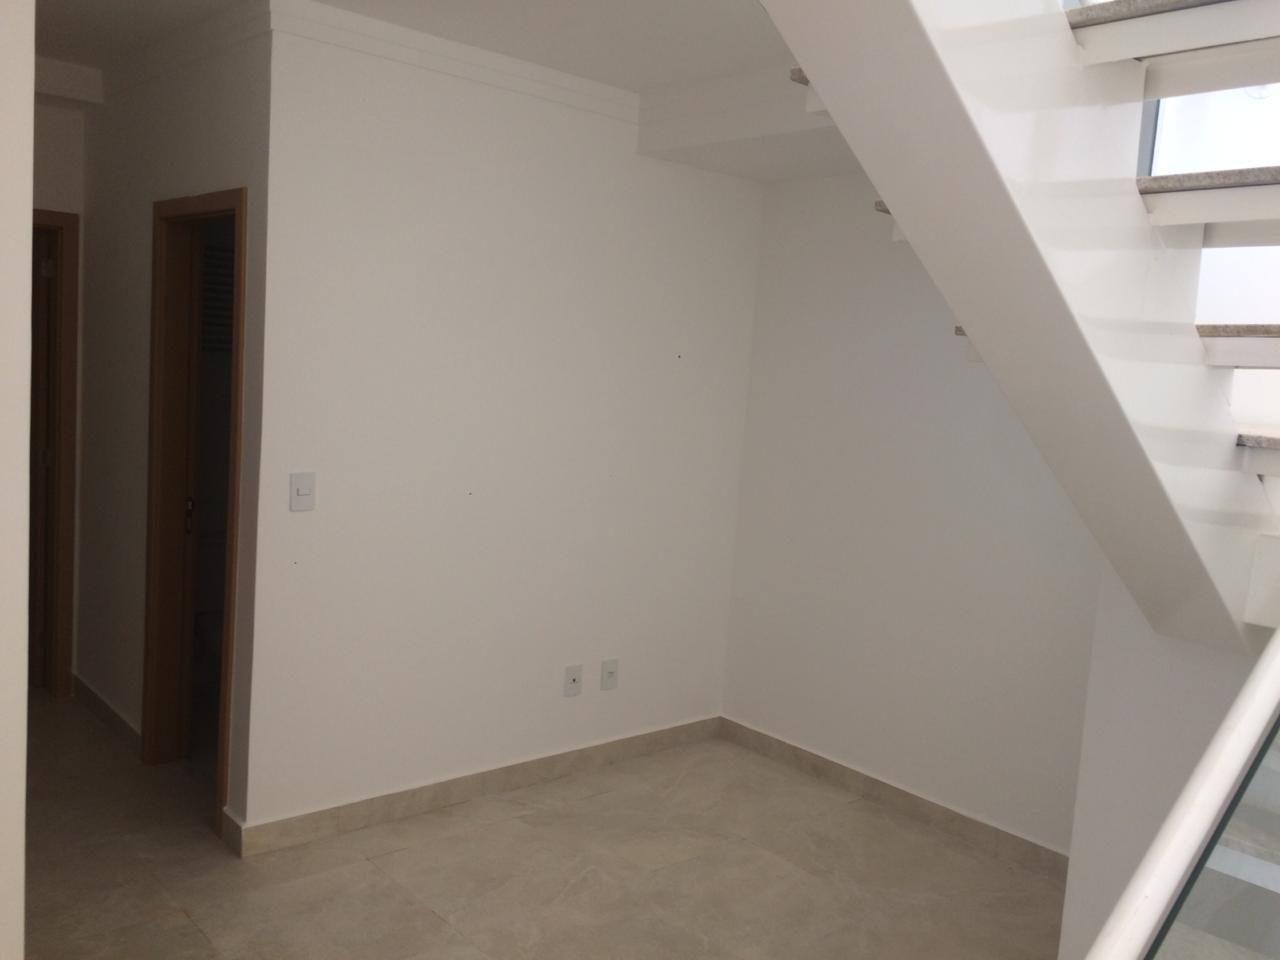 656 - Cobertura Bonfim Paulista - 3 Dormitórios